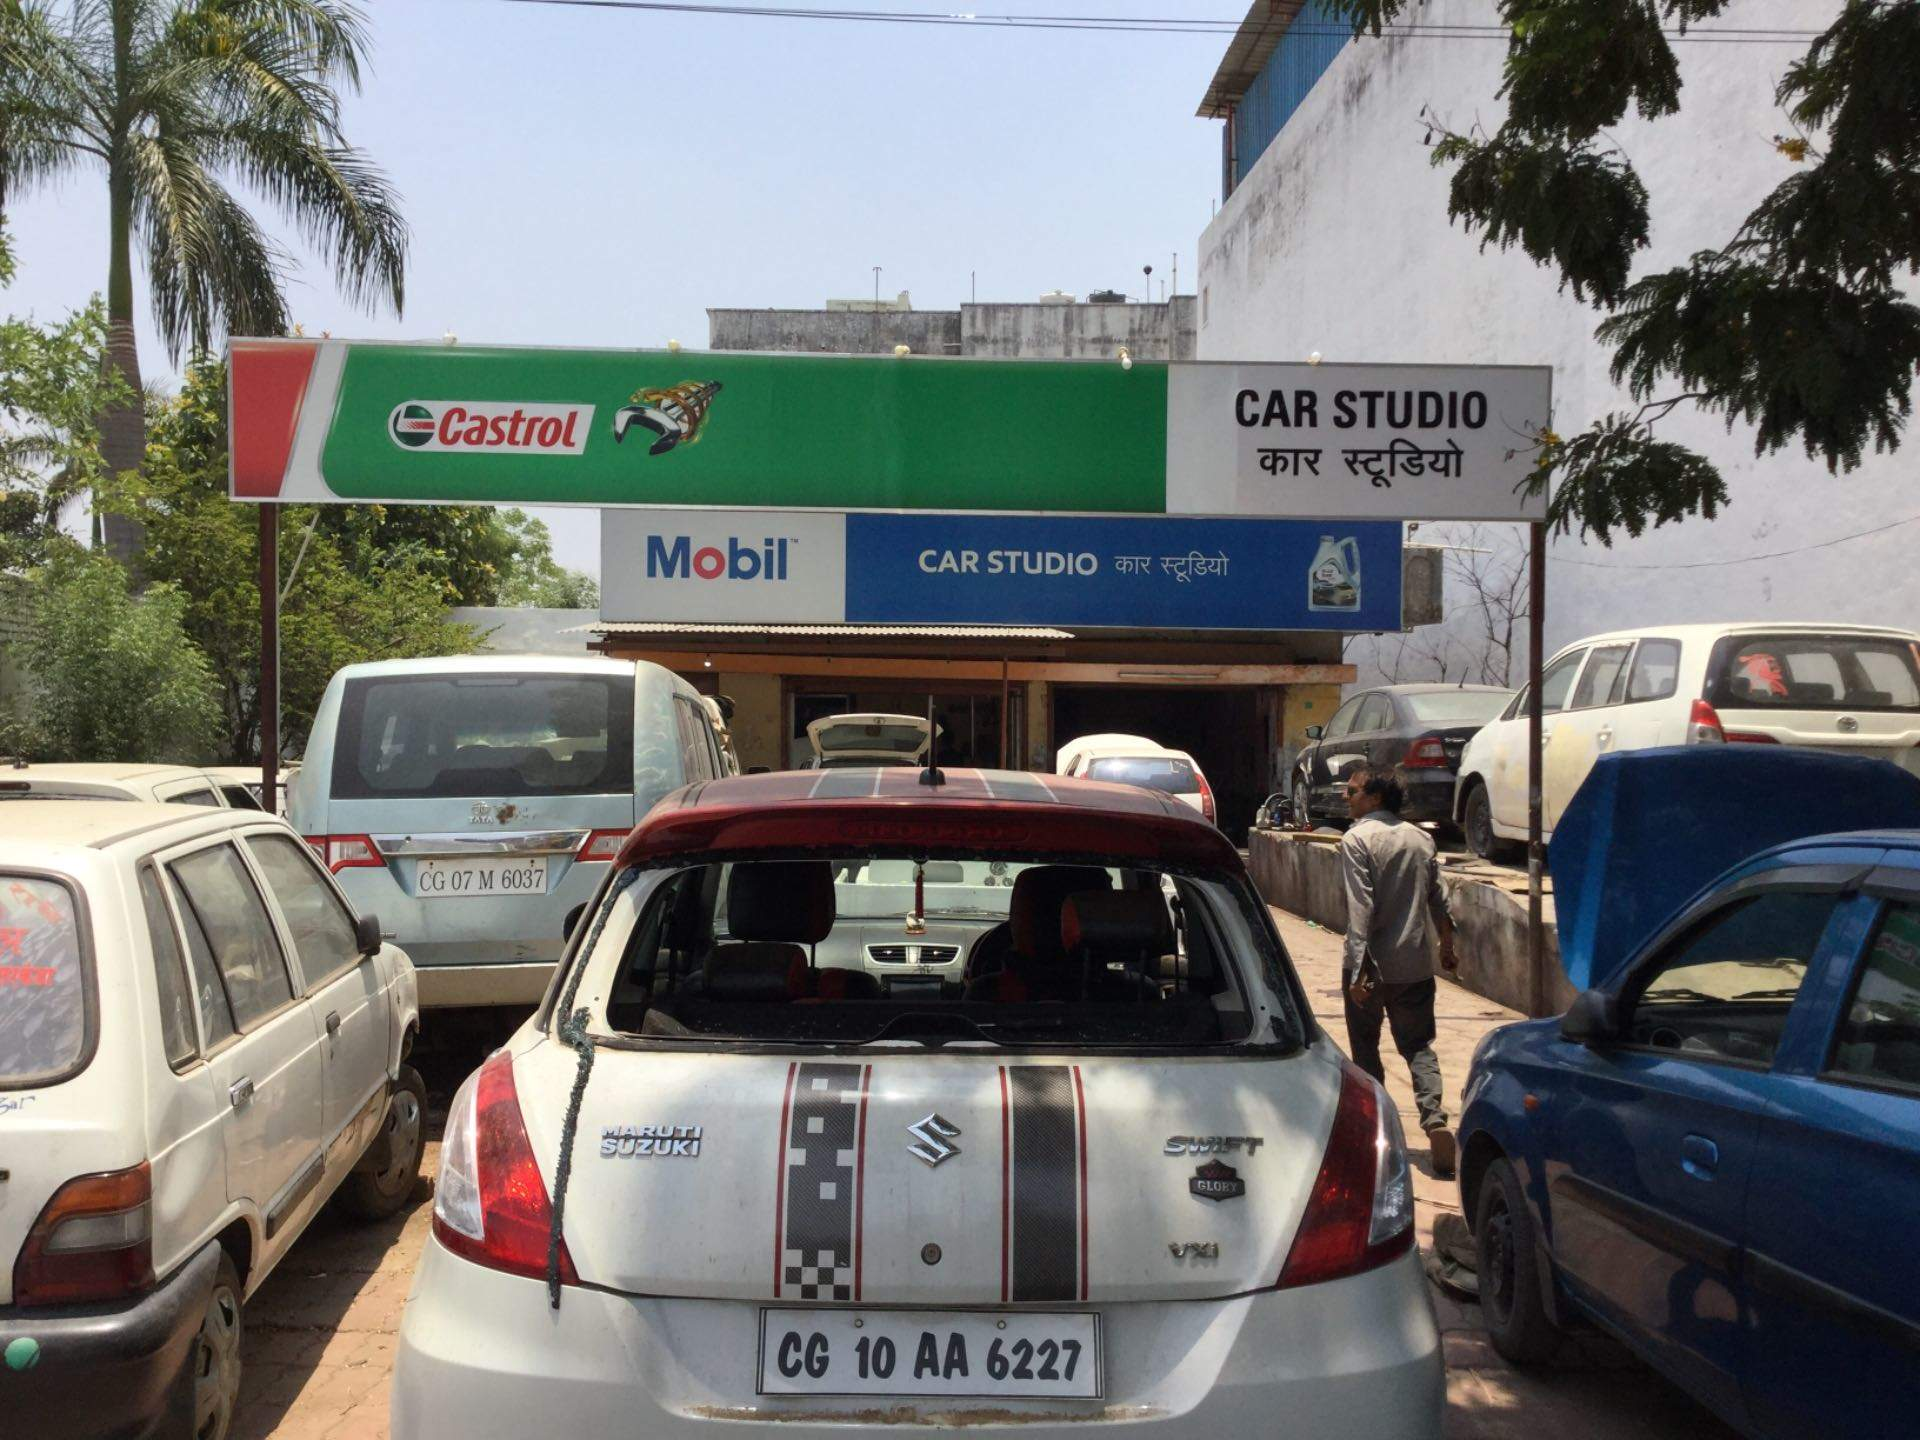 Car Accessory Dealers in Bilaspur-Chhattisgarh - Car